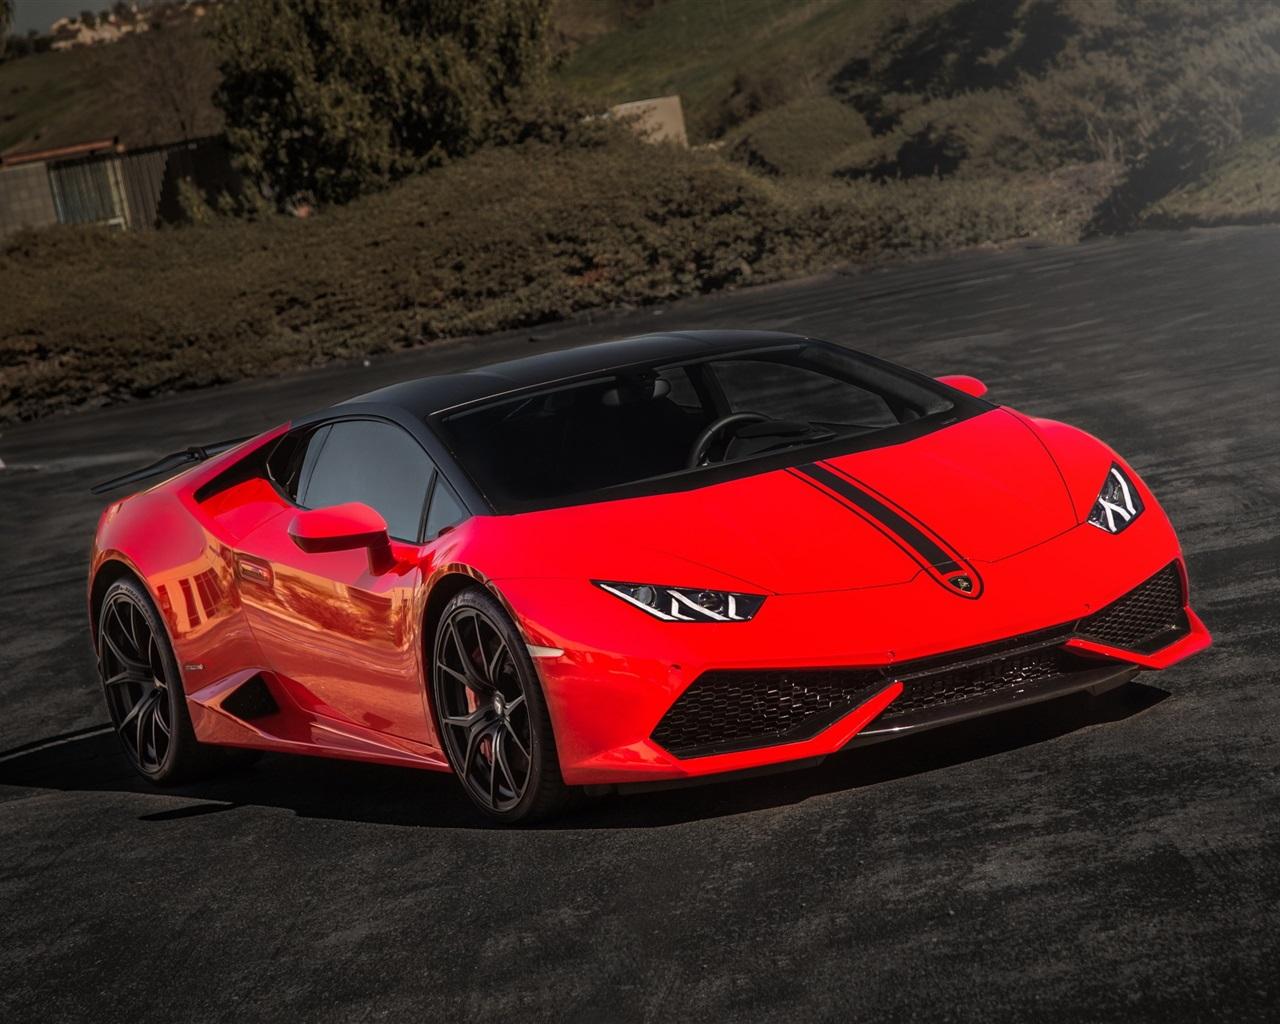 Lamborghini Huracan supercar rouge Fonds dcran 1280x1024 Fonds d 1280x1024